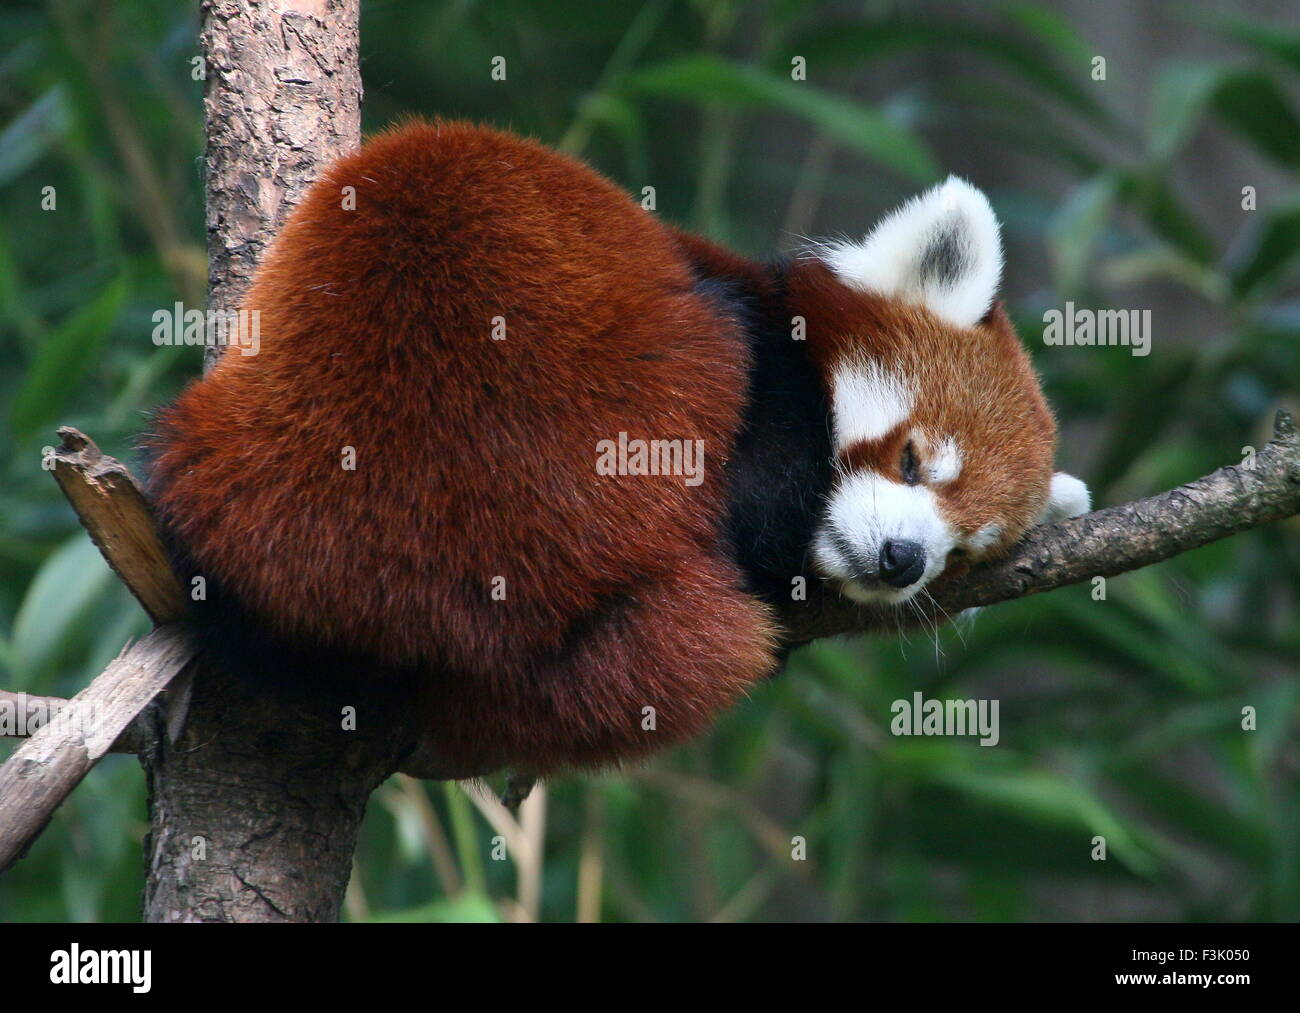 Asian Red Panda (Ailurus fulgens) sleeping in a tree - Stock Image